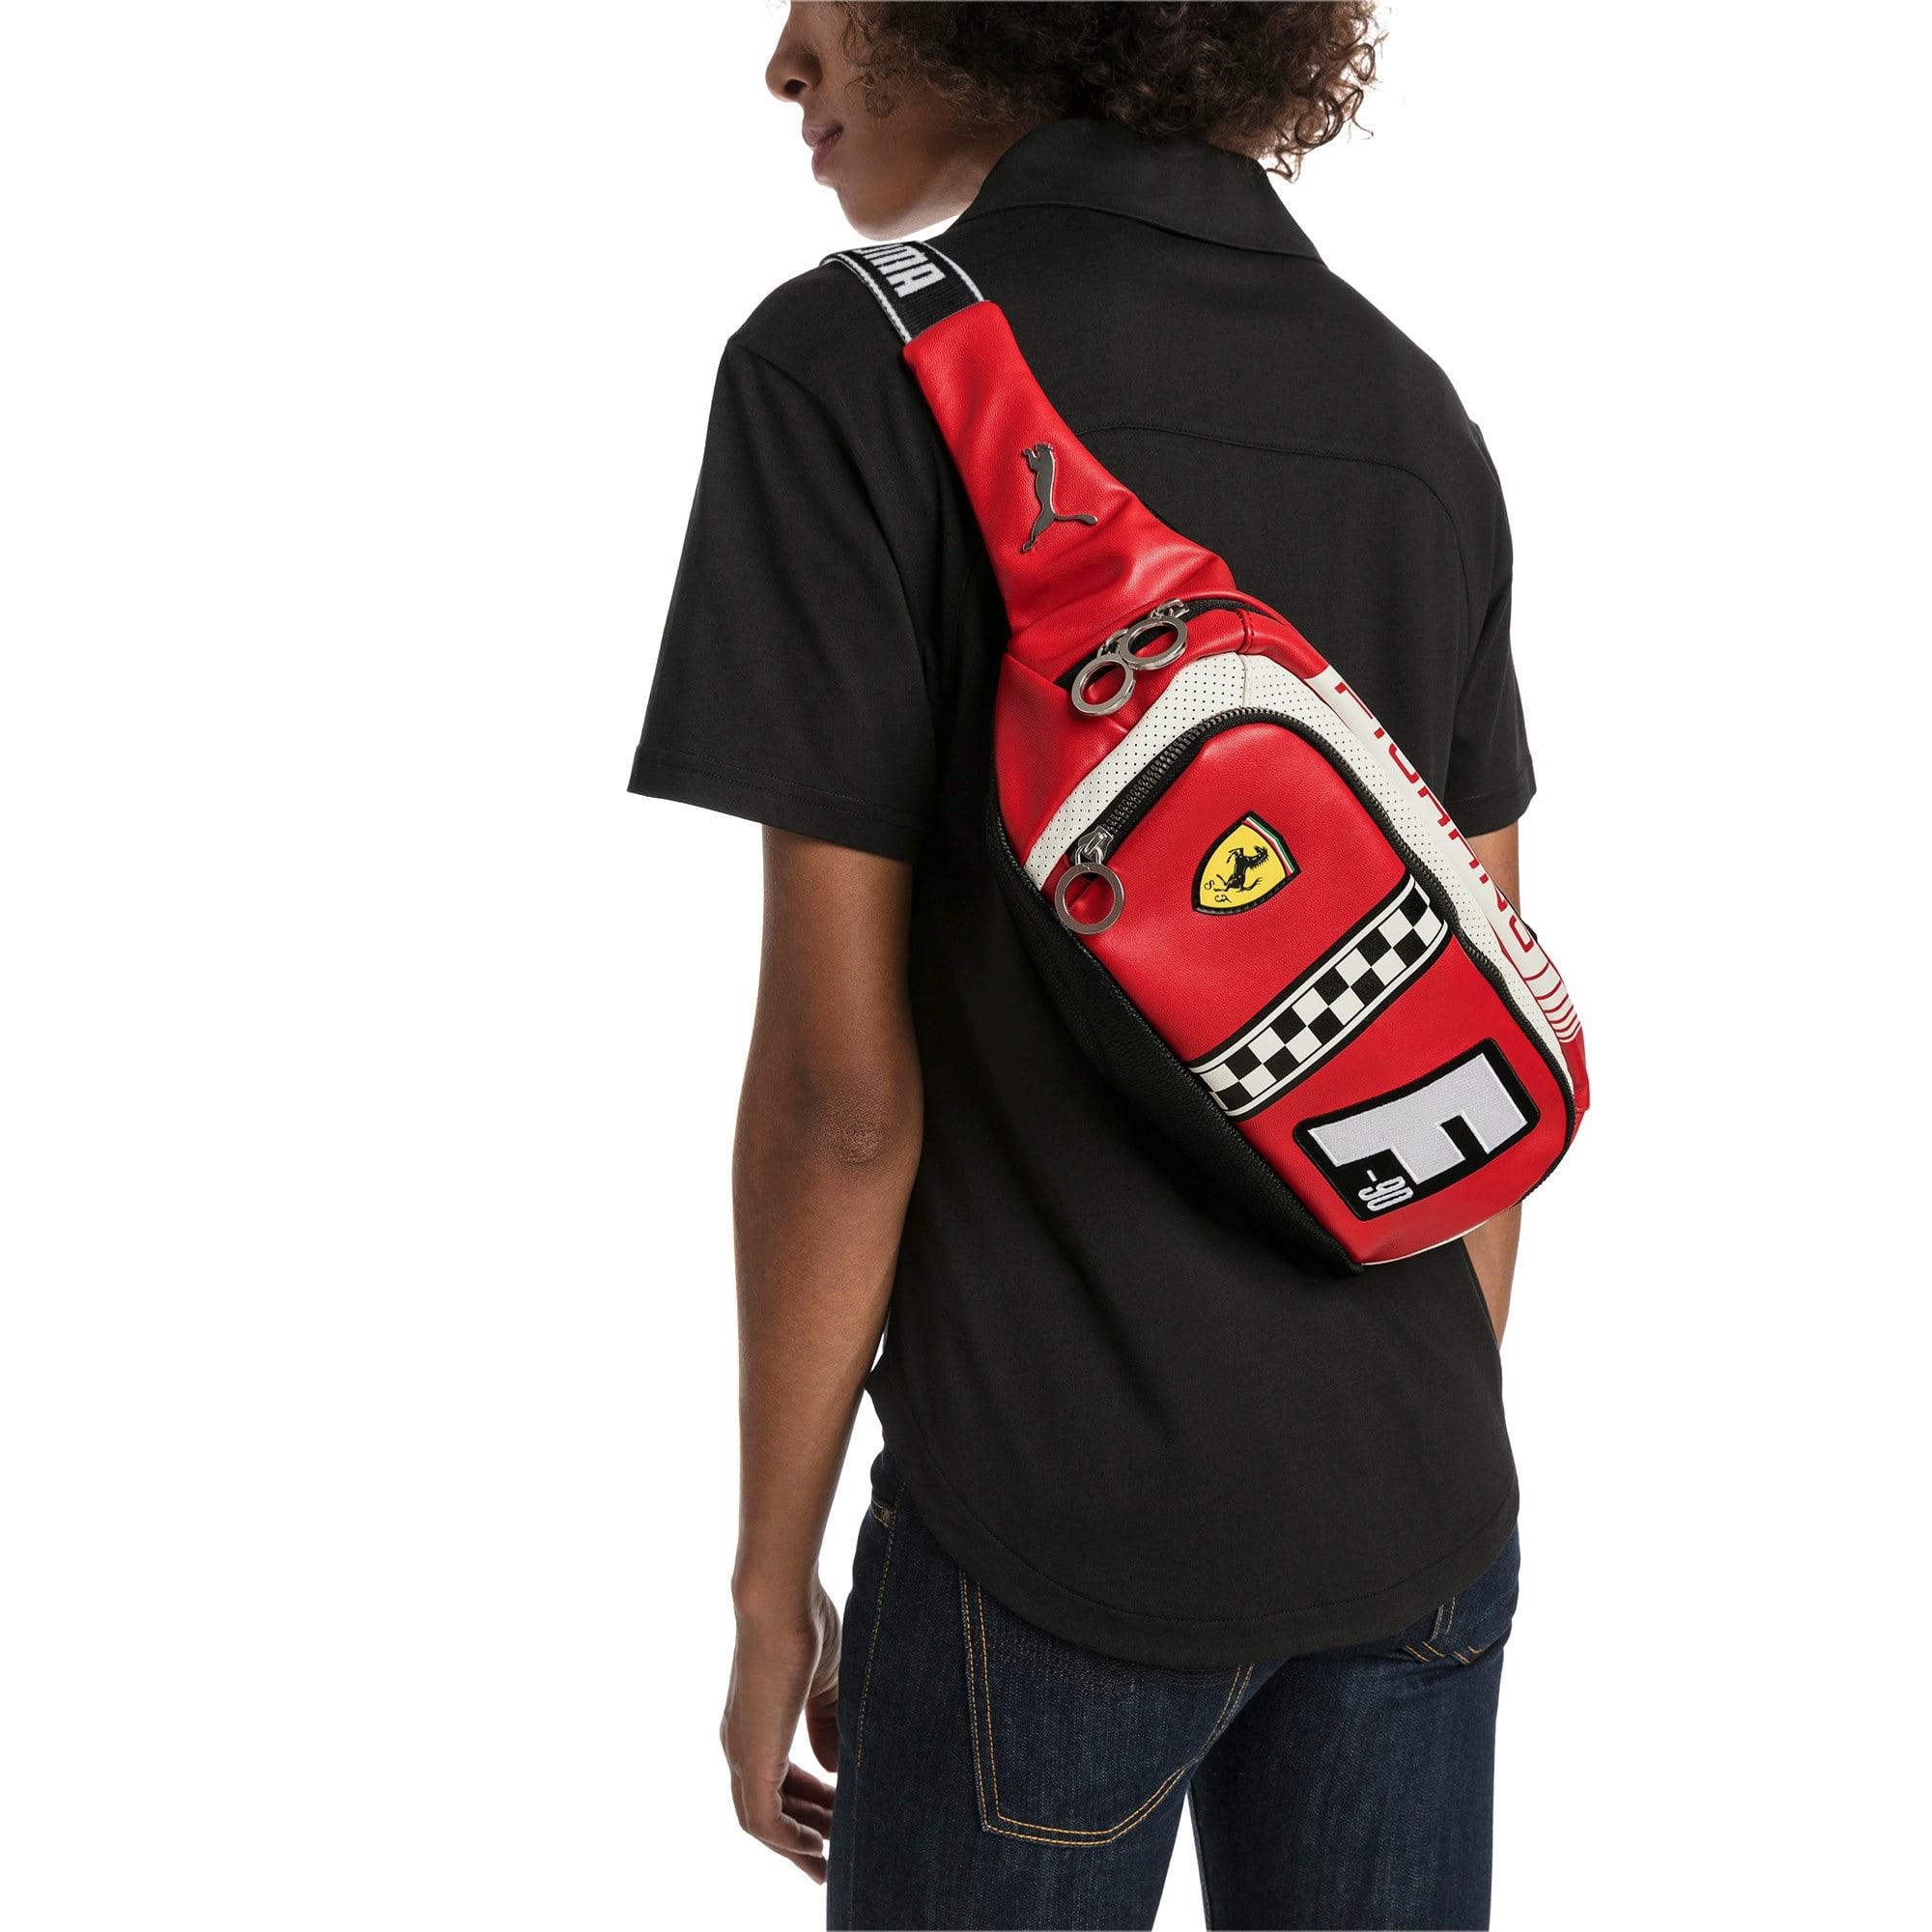 Thumbnail 2 of Scuderia Ferrari Fanwear Waist Bag, Rosso Corsa, medium